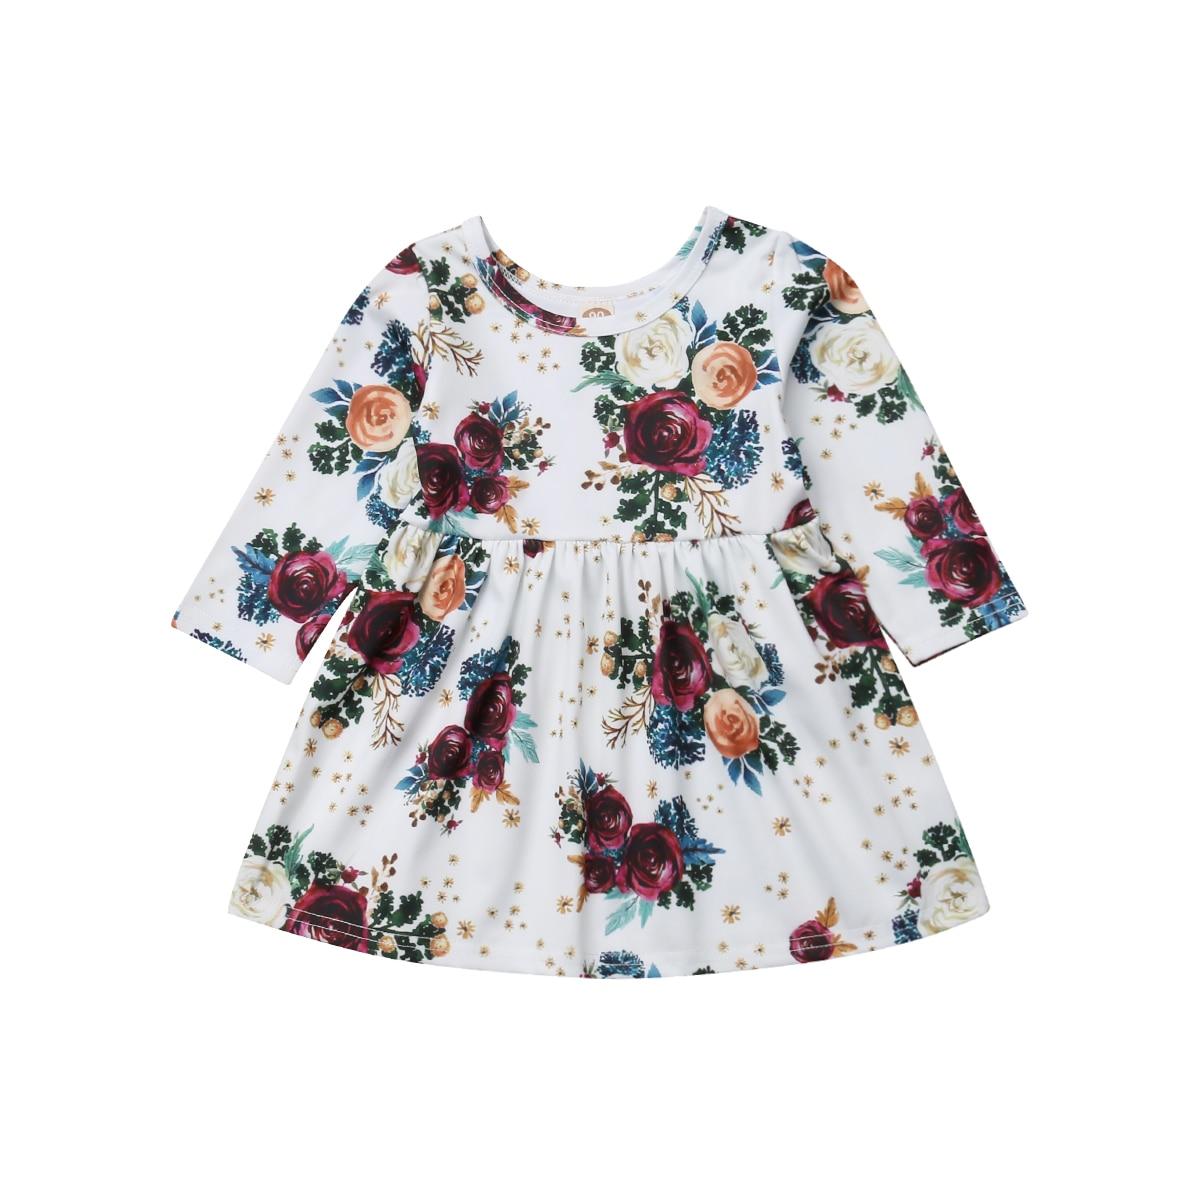 Toddler Baby Girls Floral Dress Autumn Long Sleeve Princess Party High Waist Tutu Mini Dresses